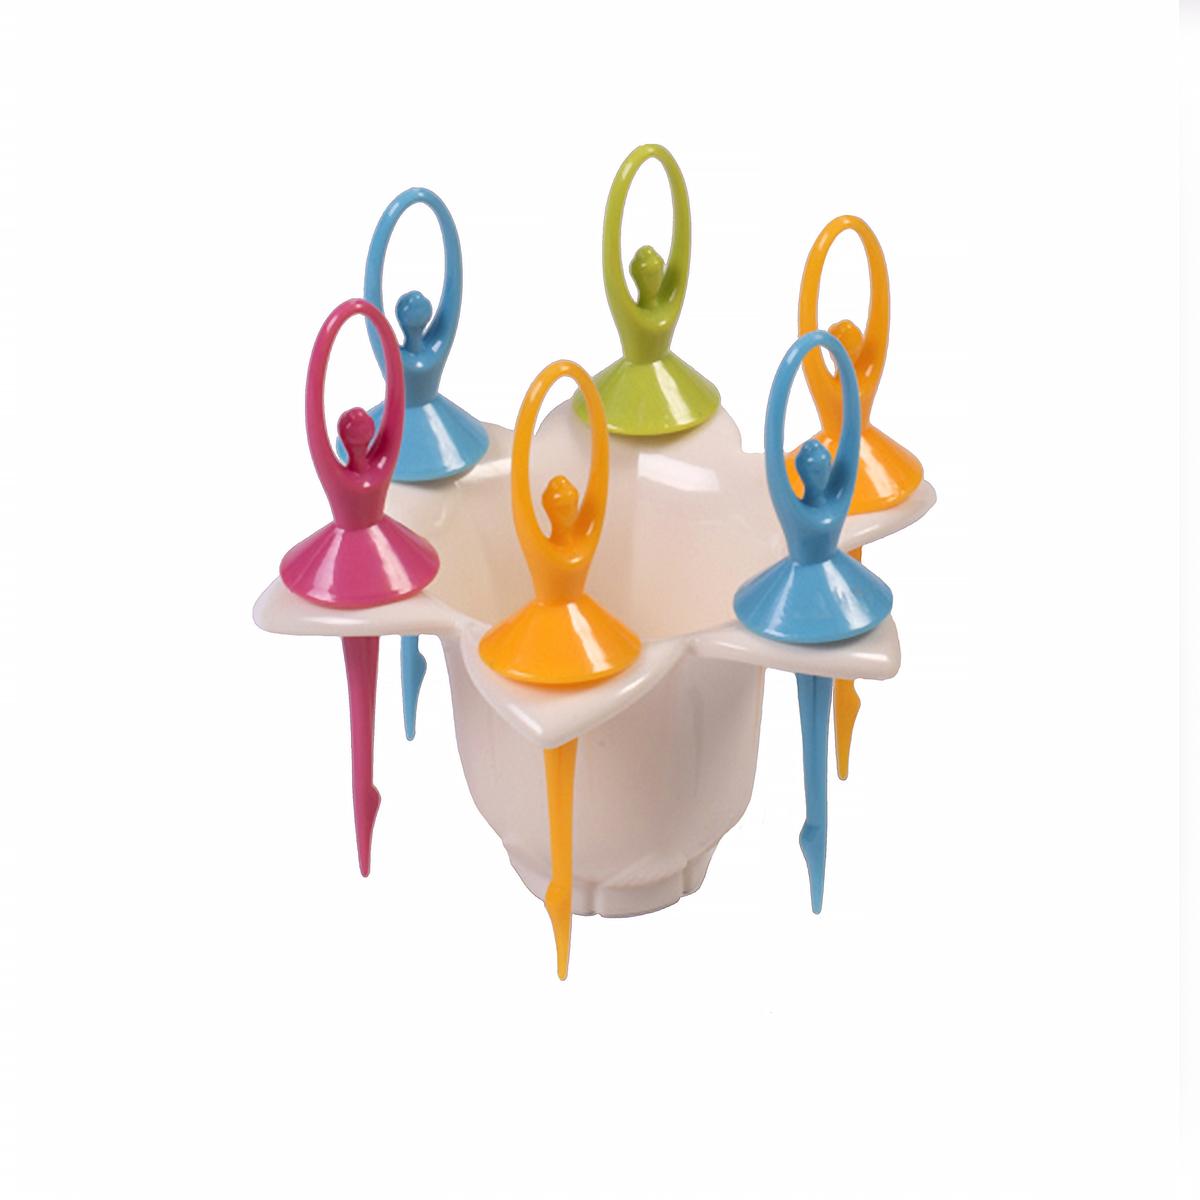 Набор шпажек для канапе Magic Home Балерины, с подставкой, 7 предметов osmrk led rear bumper light brake lamp driving light night running lamp for mazda cx 5 2012 16